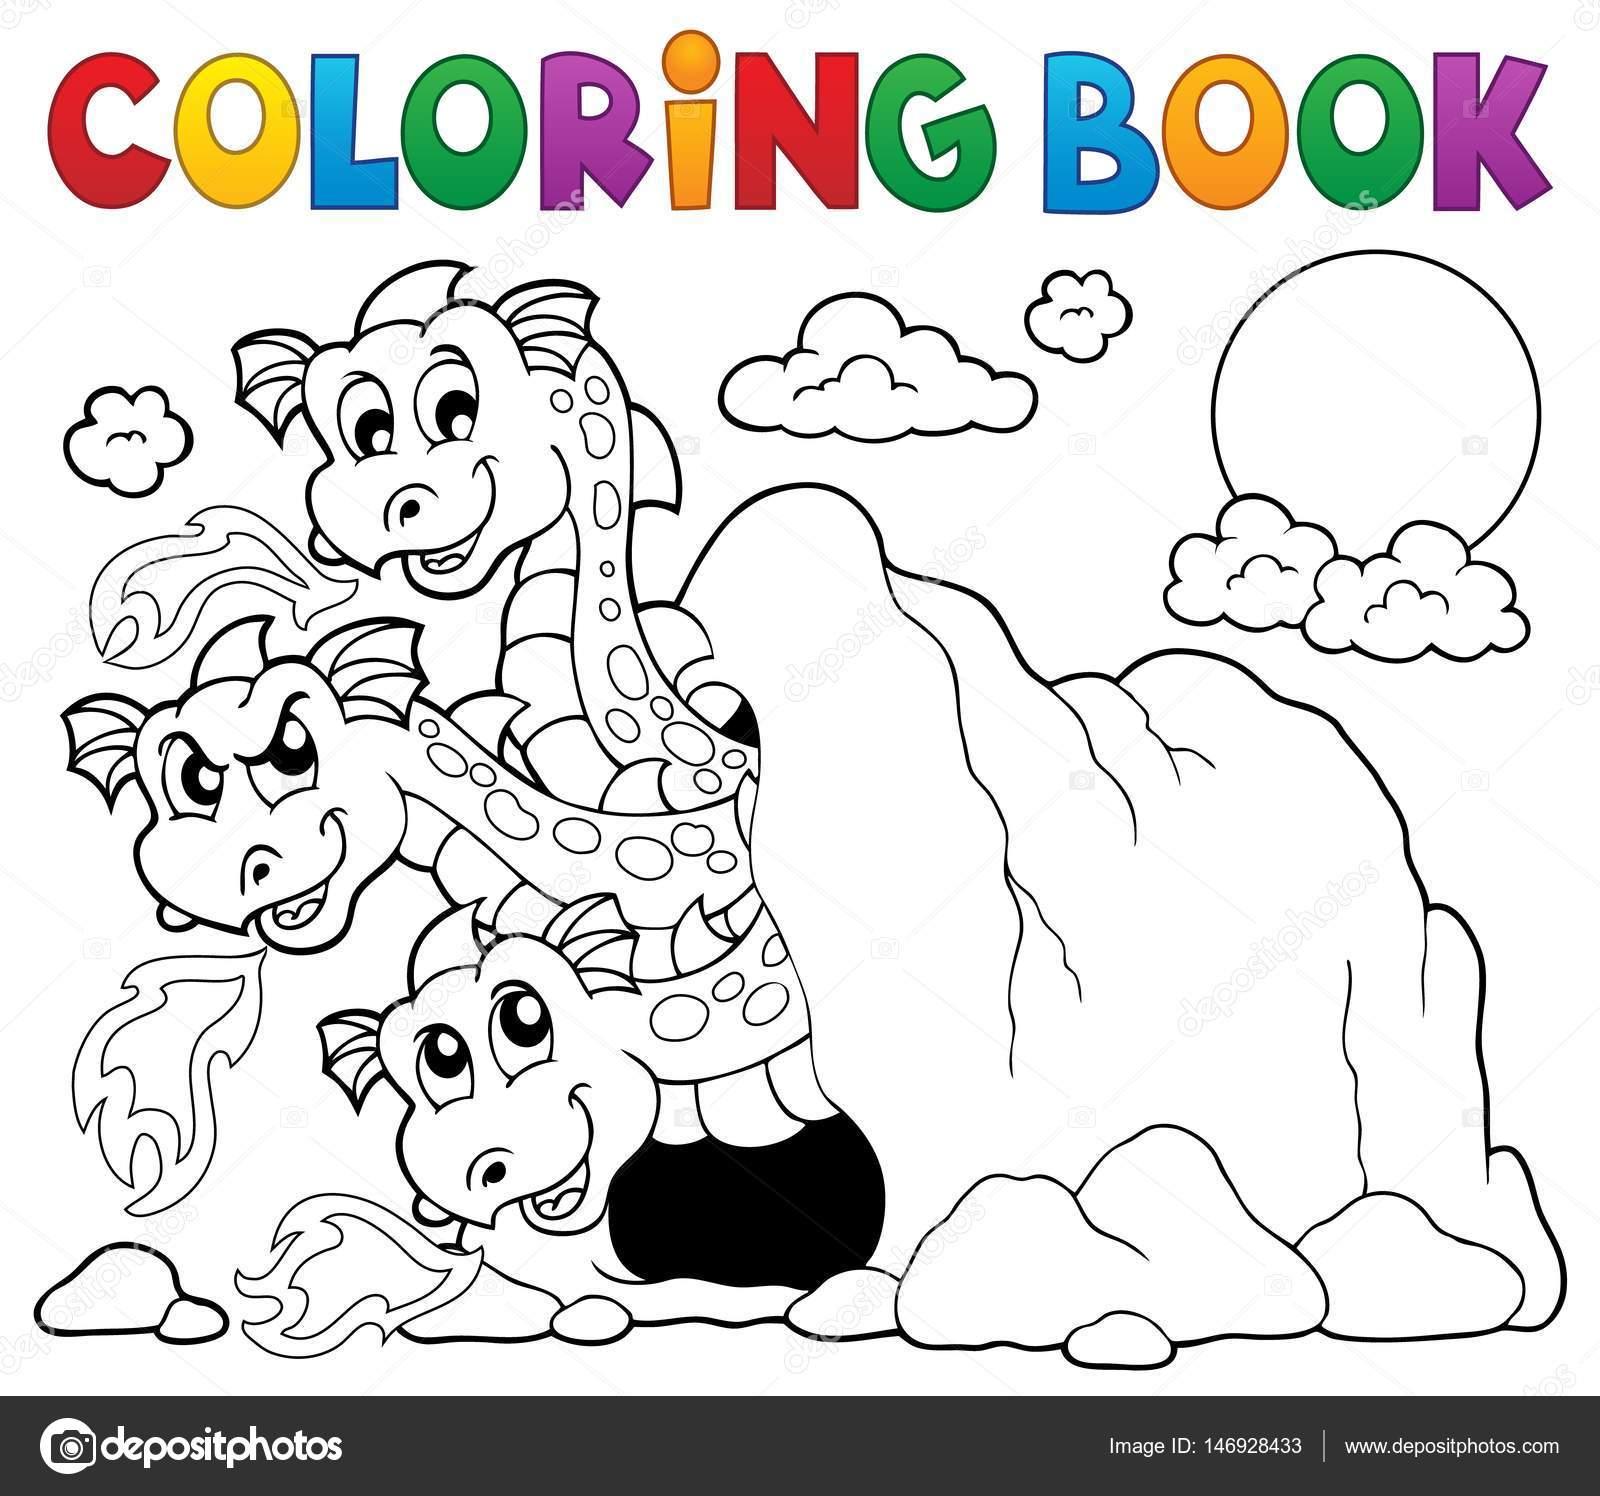 Coloring book dragon theme image 5 — Stock Vector © clairev #146928433